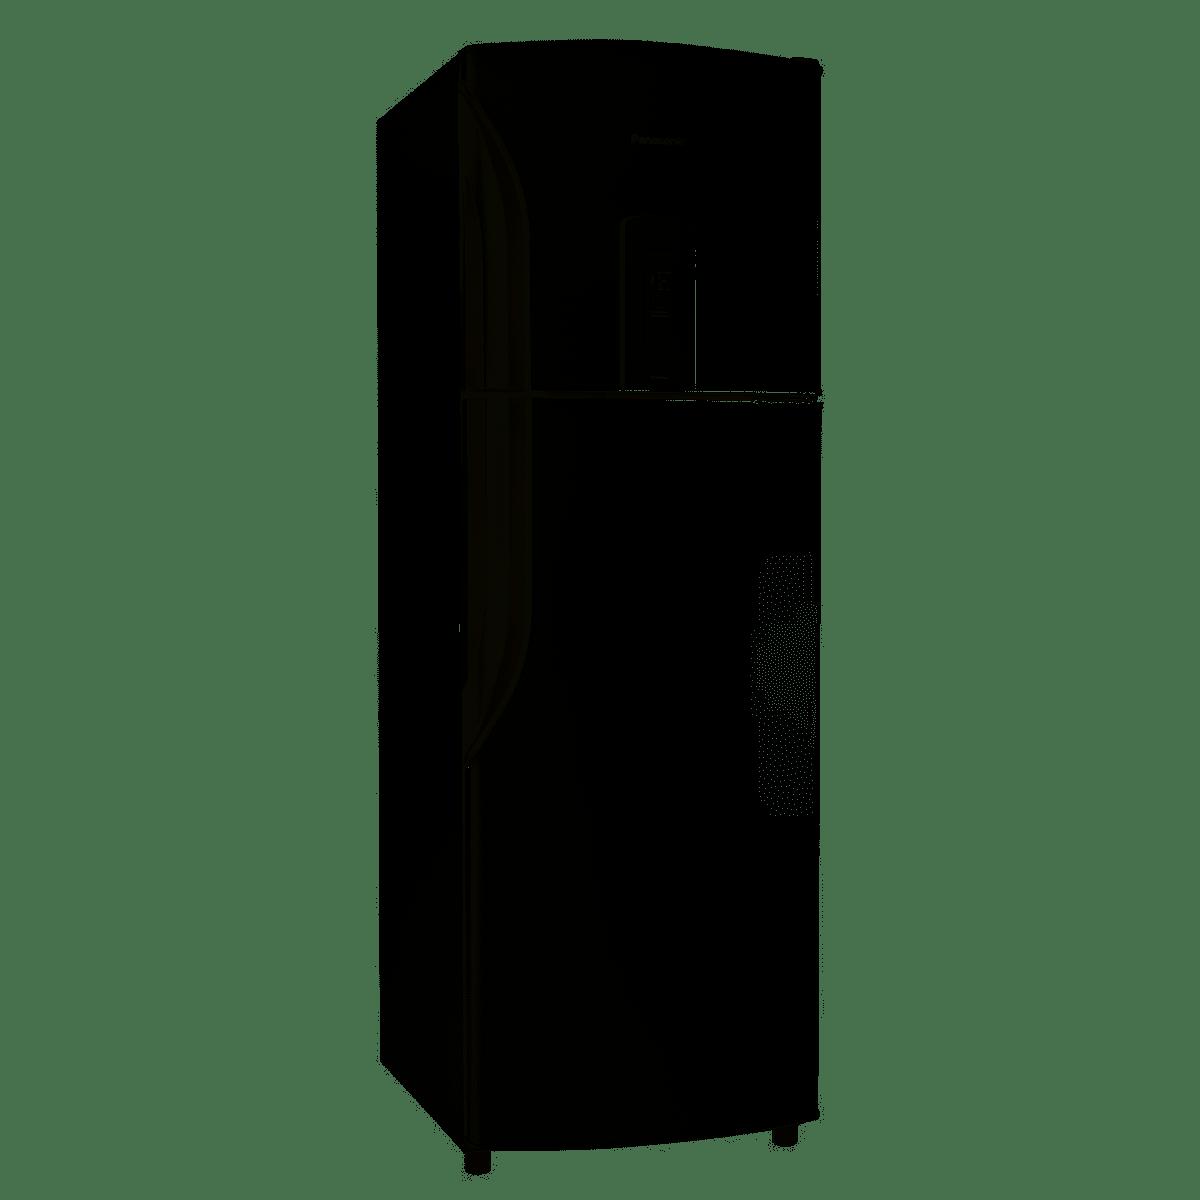 REFRIGERADOR PANASONIC BT40BD1W 387 LITROS FROST FREE